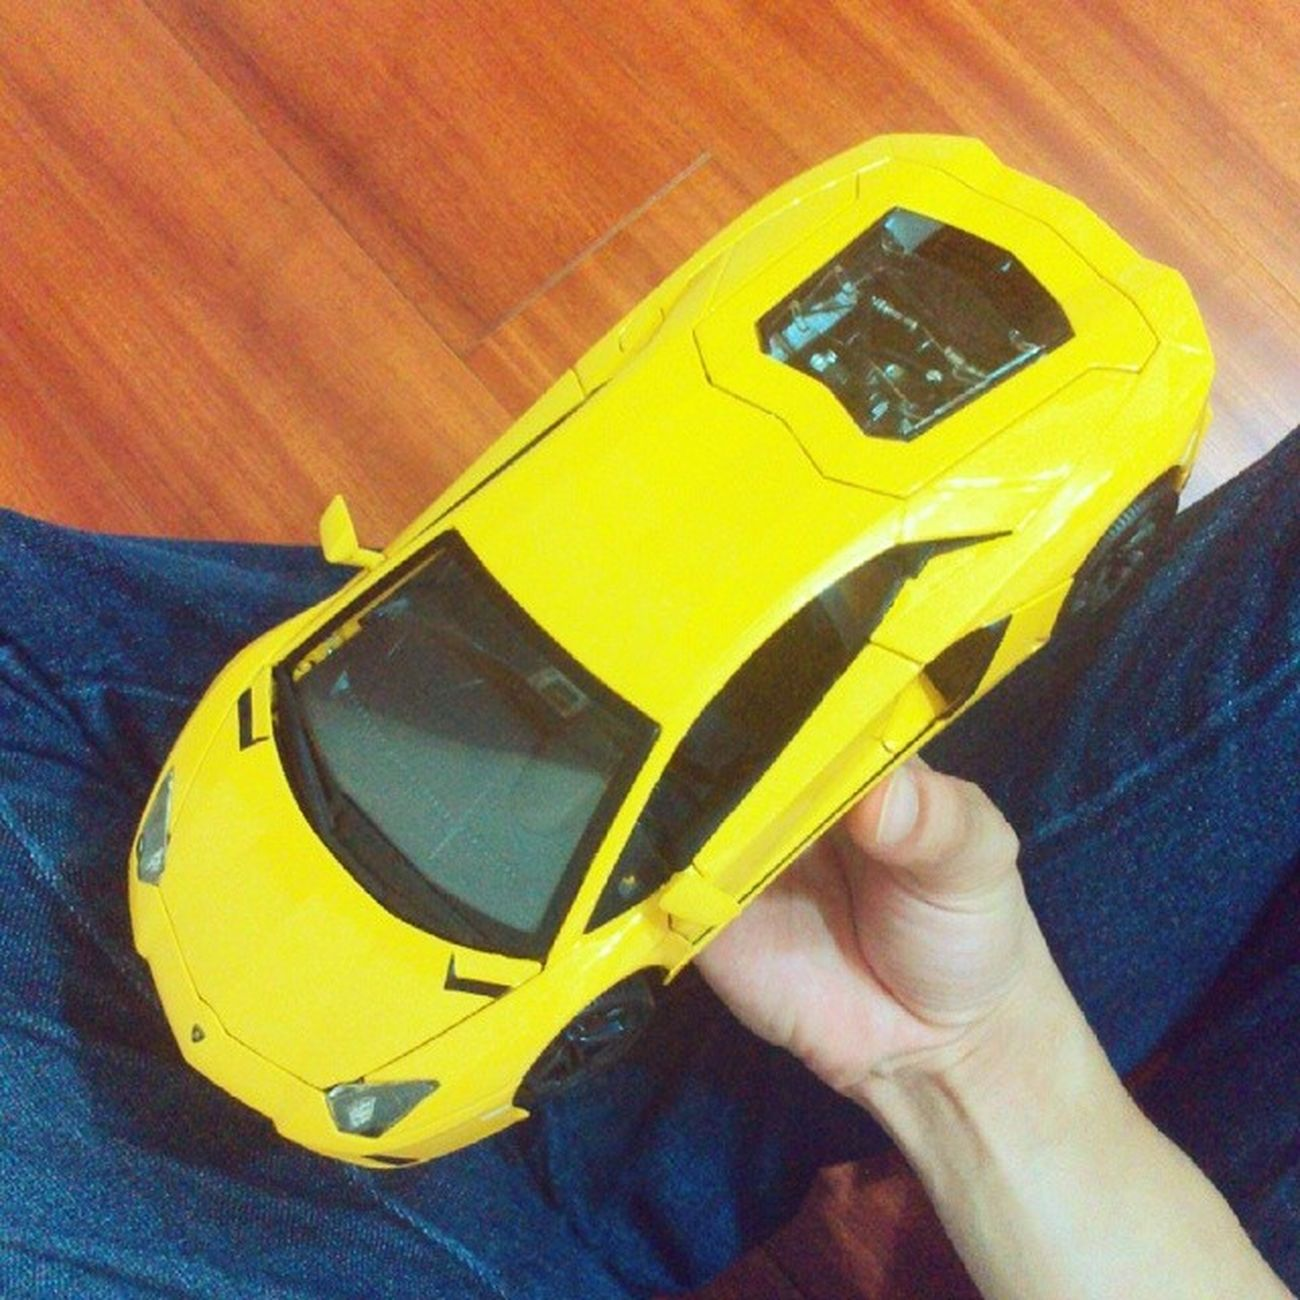 耶~~~新ㄅㄨㄅㄨ Lamborghini Aventador Lp700 Bburago  modelcartoy